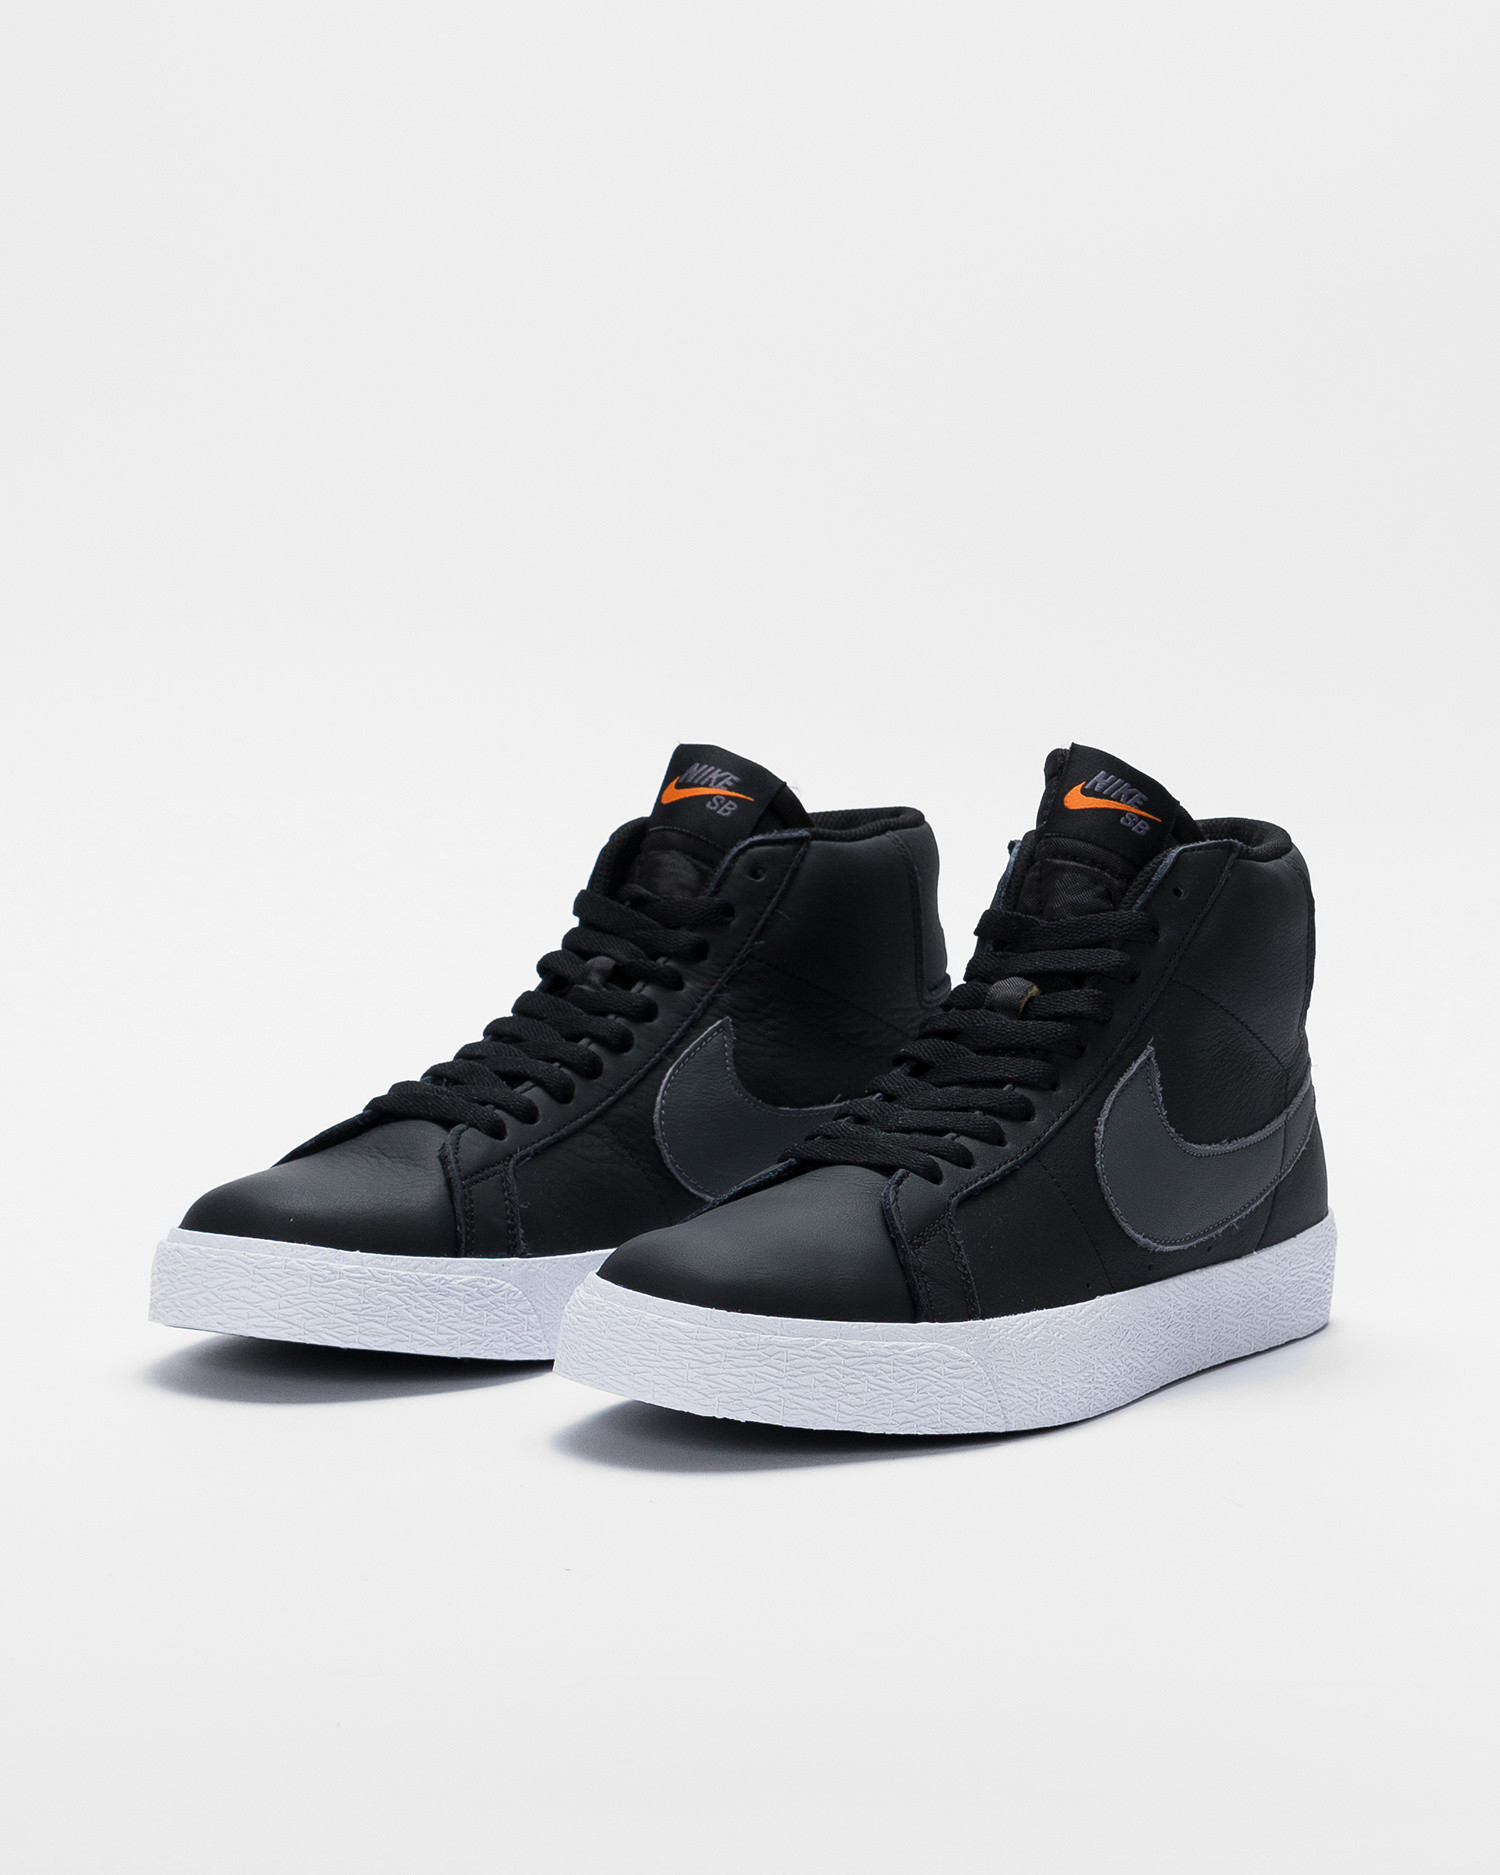 Nike SB Zoom Blazer Mid Iso Black/Dark Grey-black-white